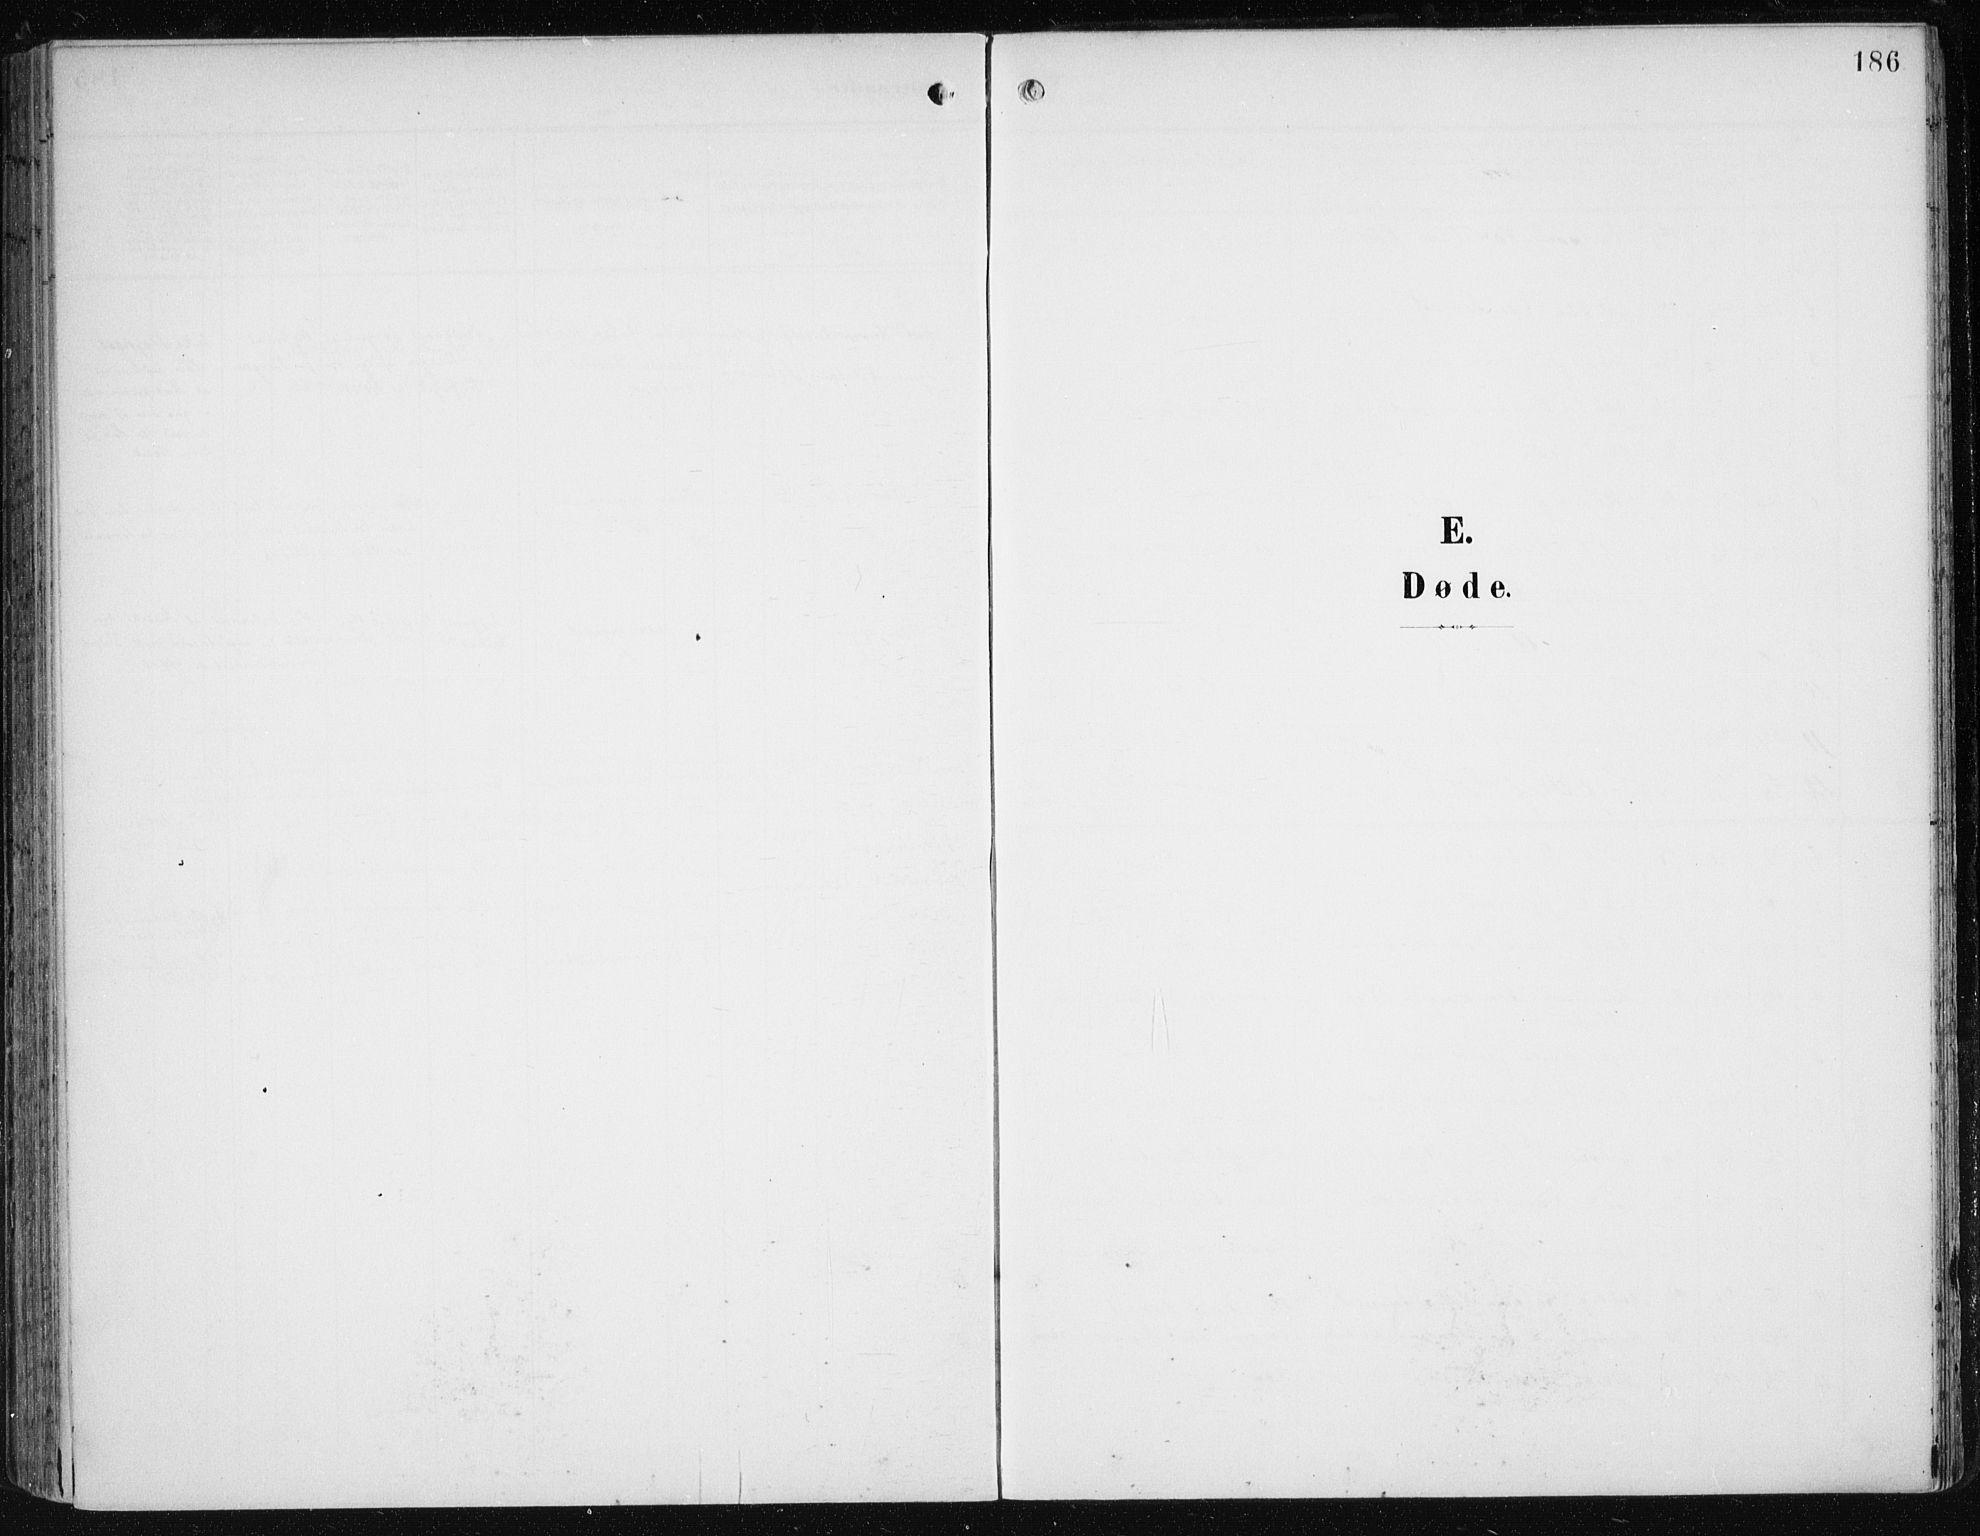 SAB, Fana Sokneprestembete, H/Haa/Haai/L0003: Ministerialbok nr. I 3, 1900-1912, s. 186